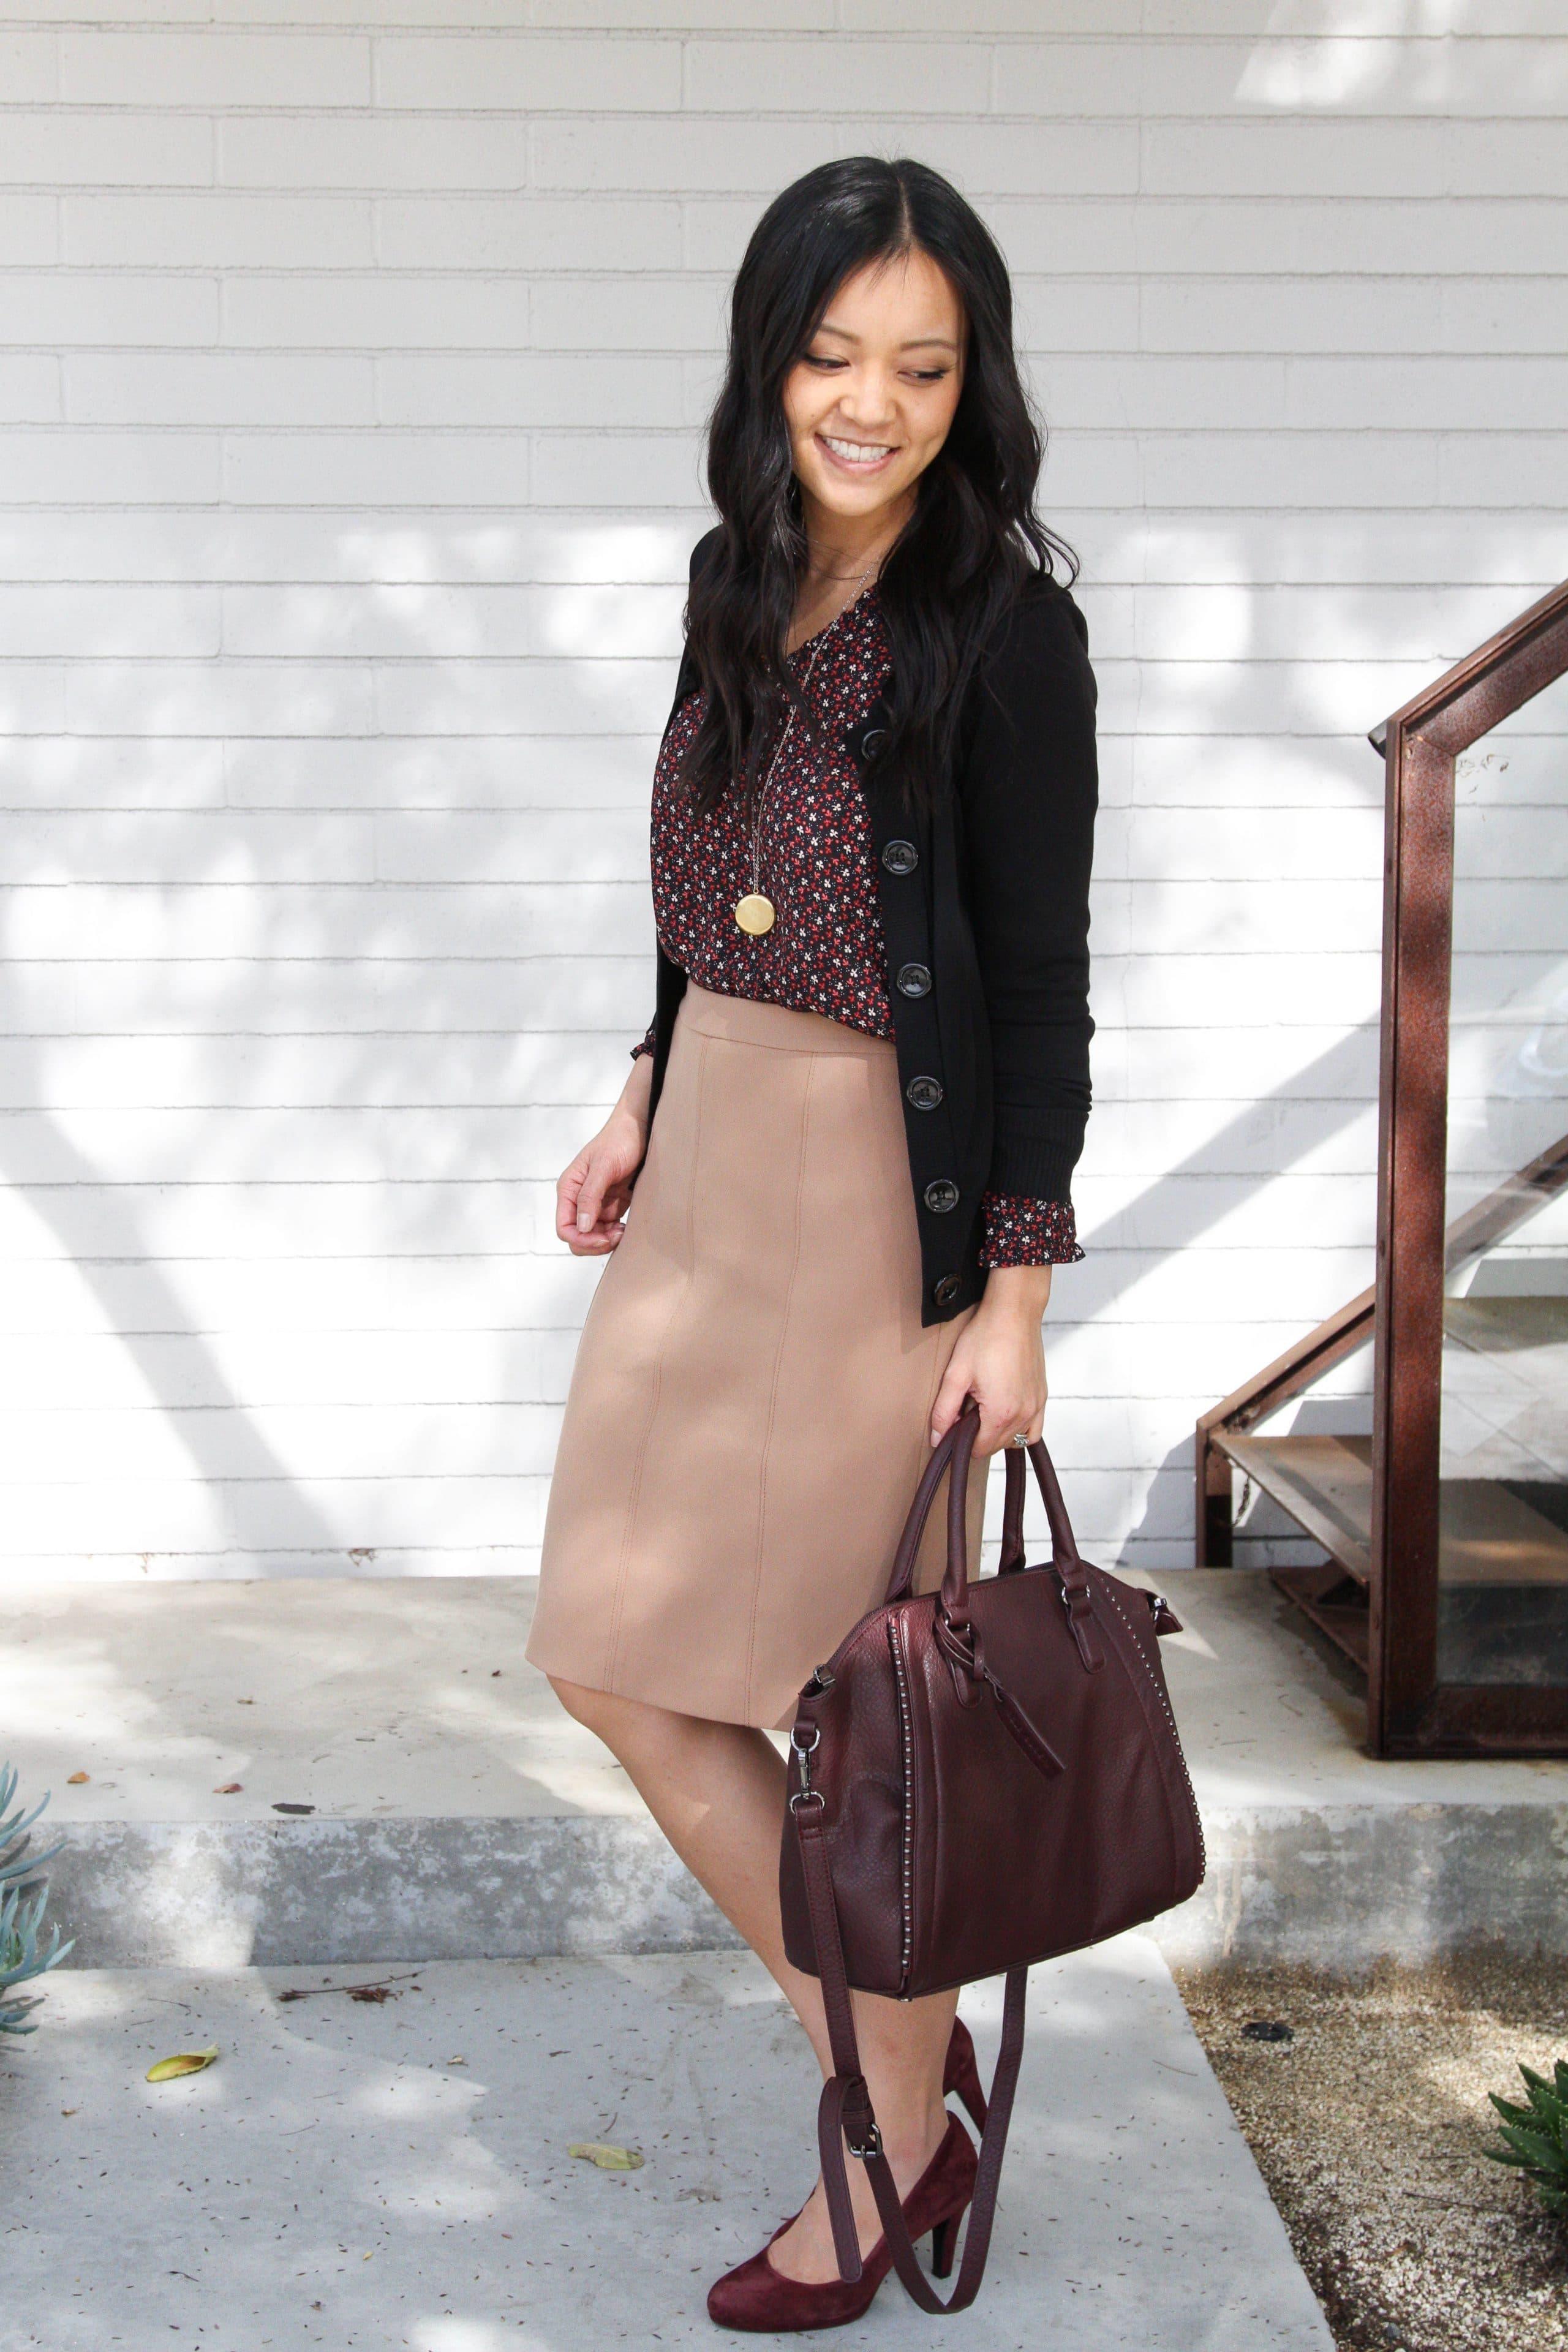 Tan Pencil Skirt + Maroon Pumps + Bag + Floral Top + Black Cardigan